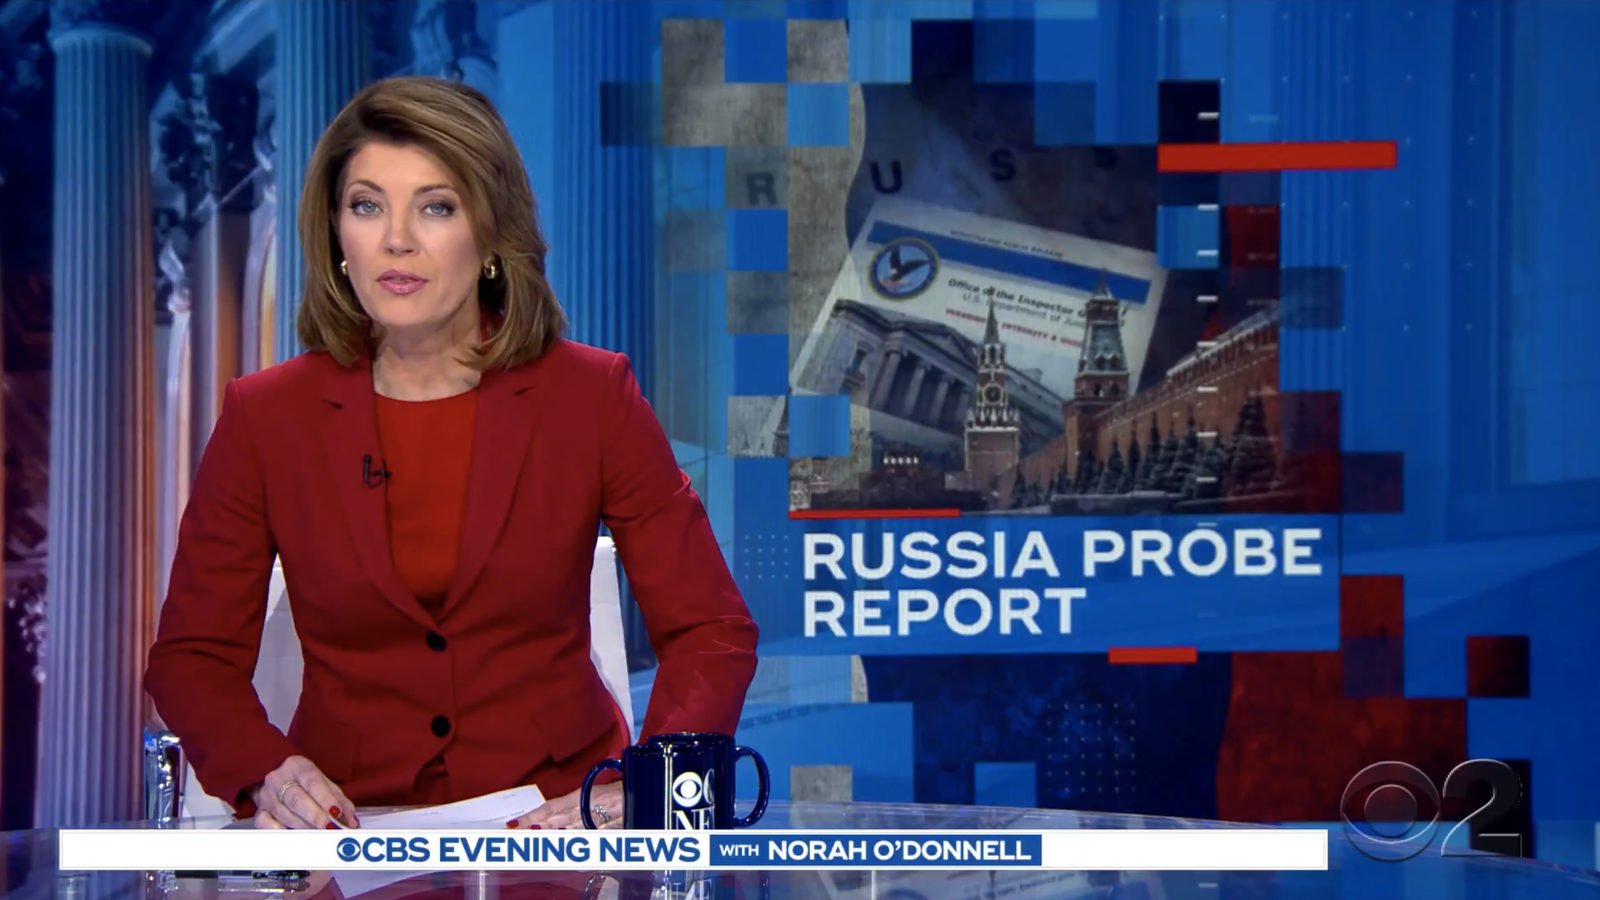 NCS_CBS-News-Washington-Bureau_STUDIO-2019_0007